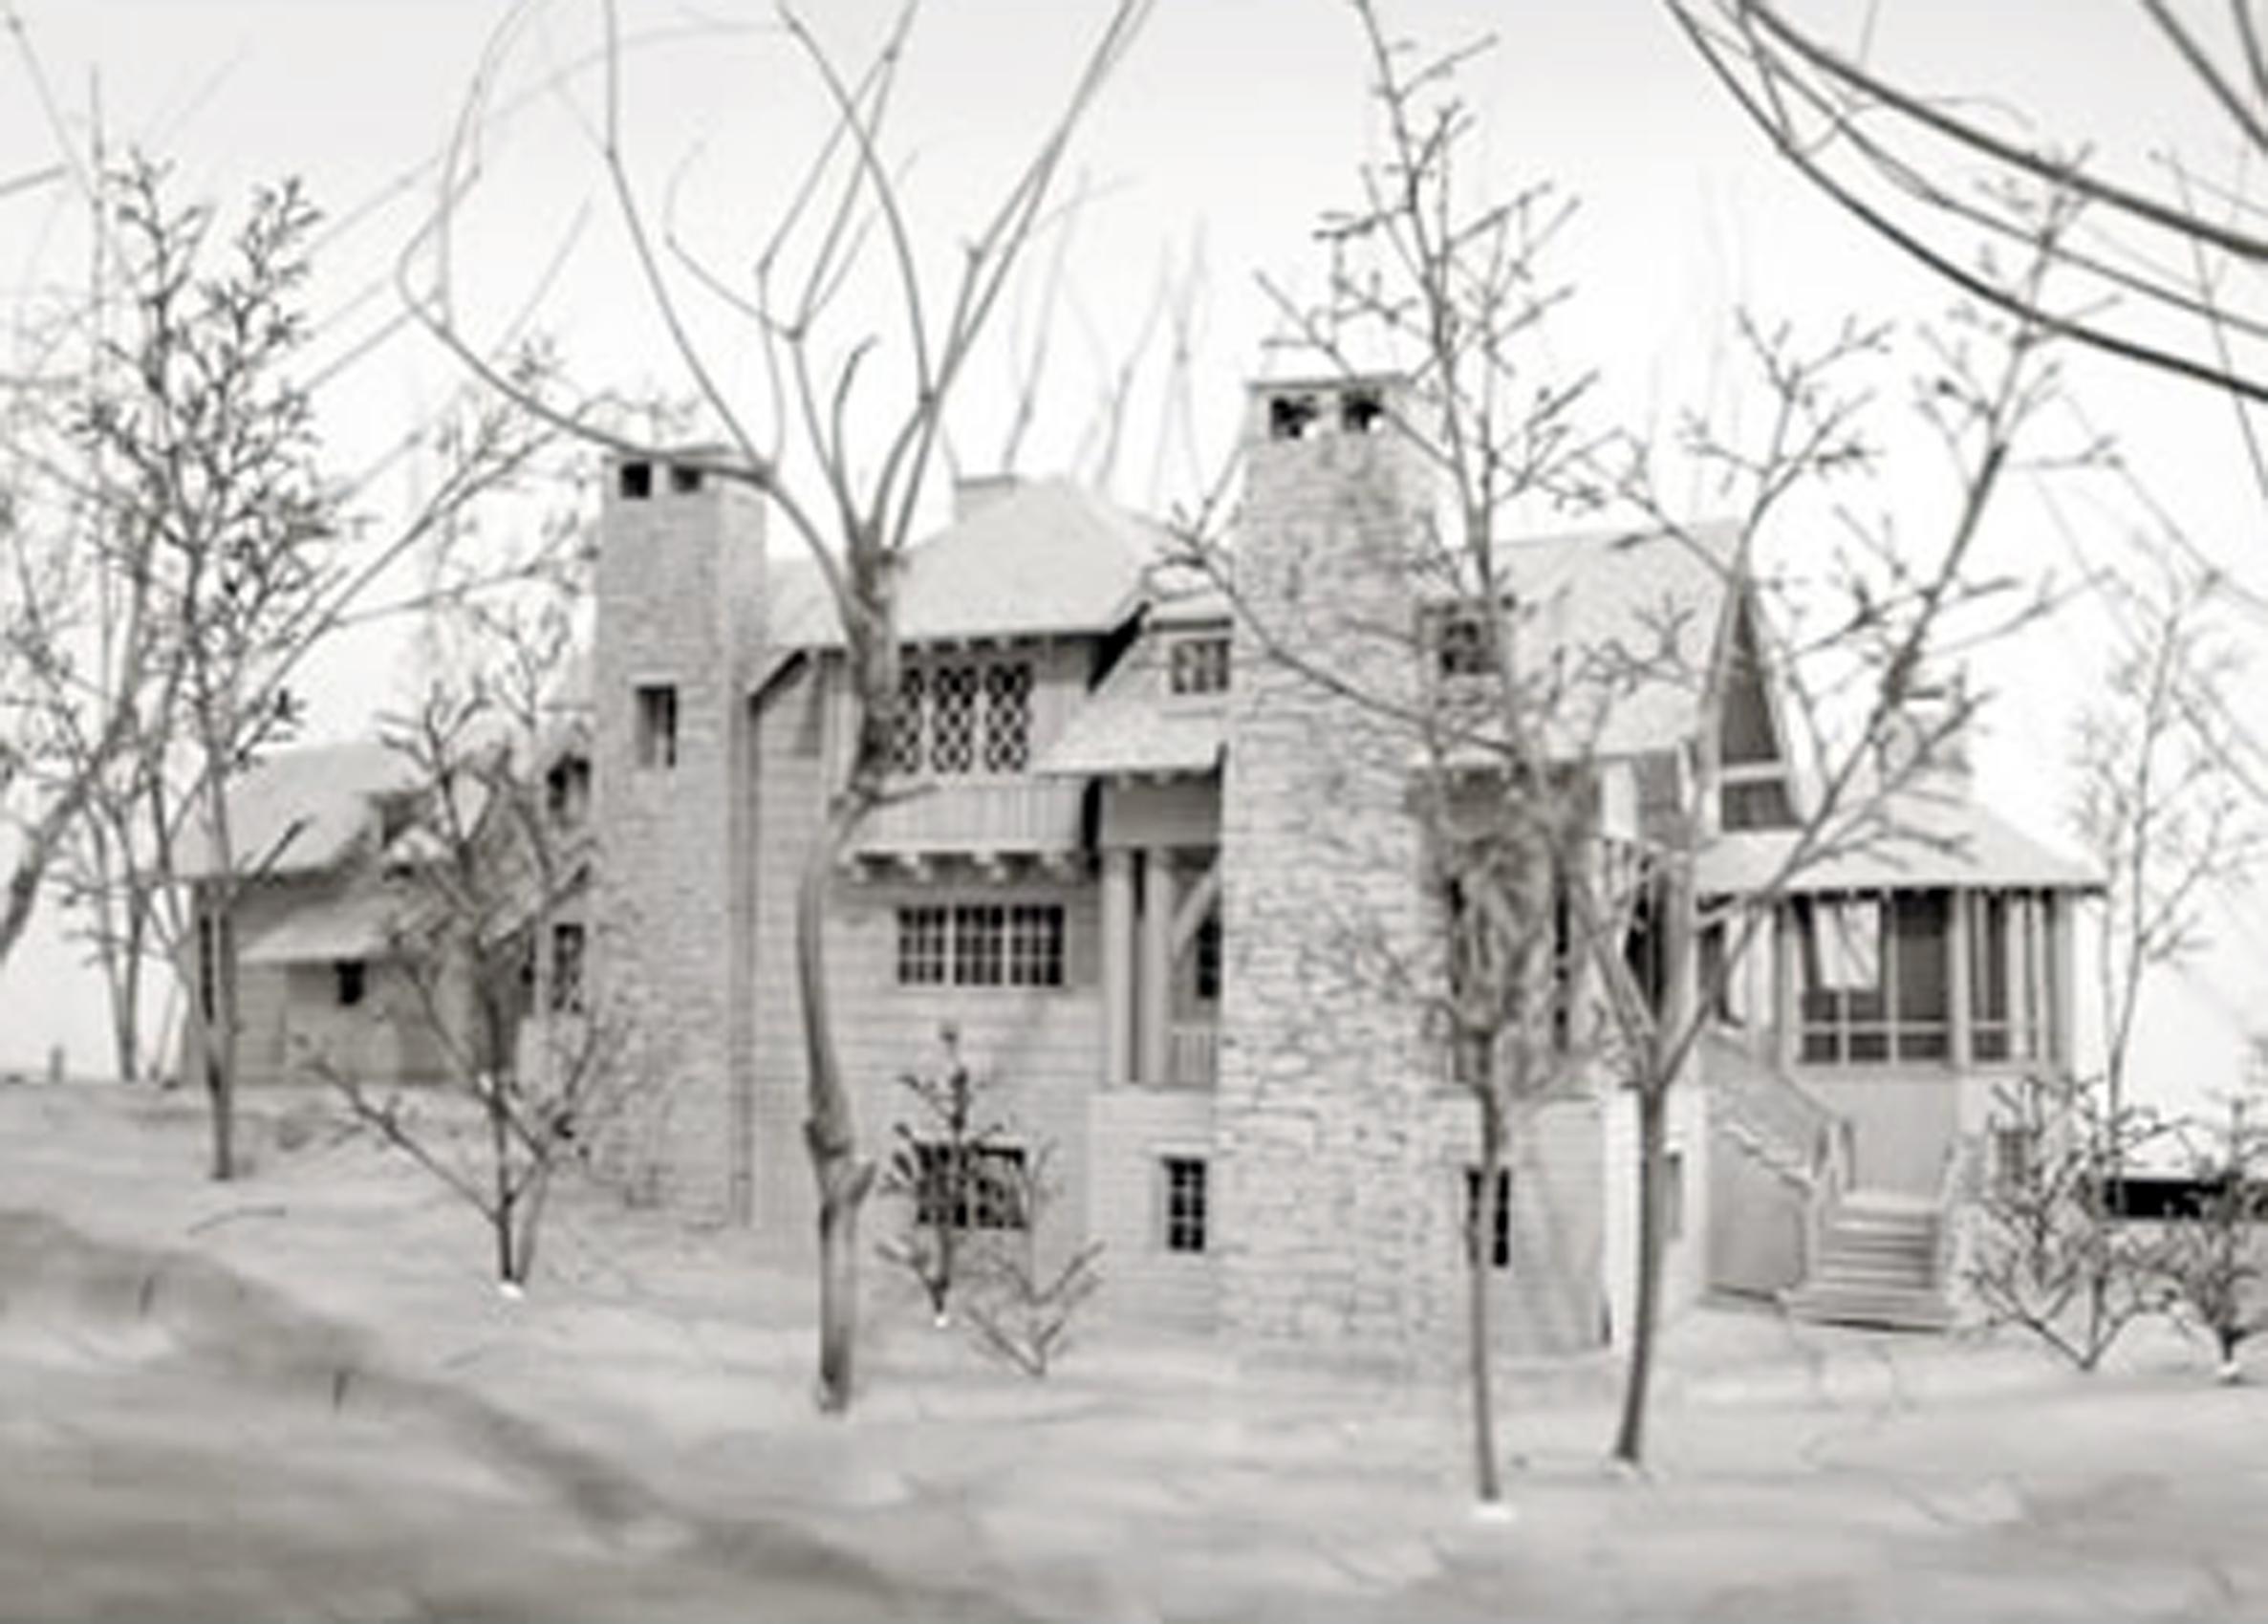 Lake_Placid.New_York.Lake_House.Robert_Orr_&_Associates.Architecture.Landscape_Architecture.Urbanism.Camp.Model.Pursley_Dixon.jpg